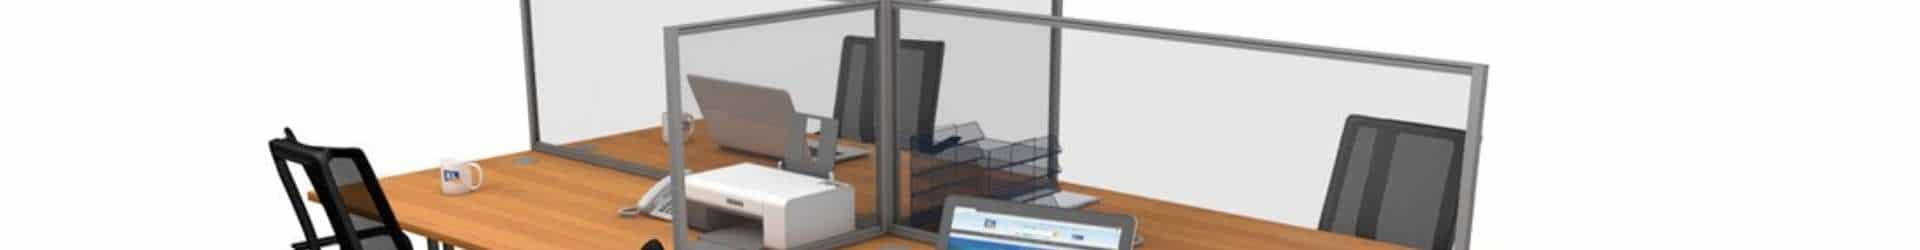 anandplastics.com, office partition, acrylic partition, office partition panels, acrylic partition wall, acrylic partition plates